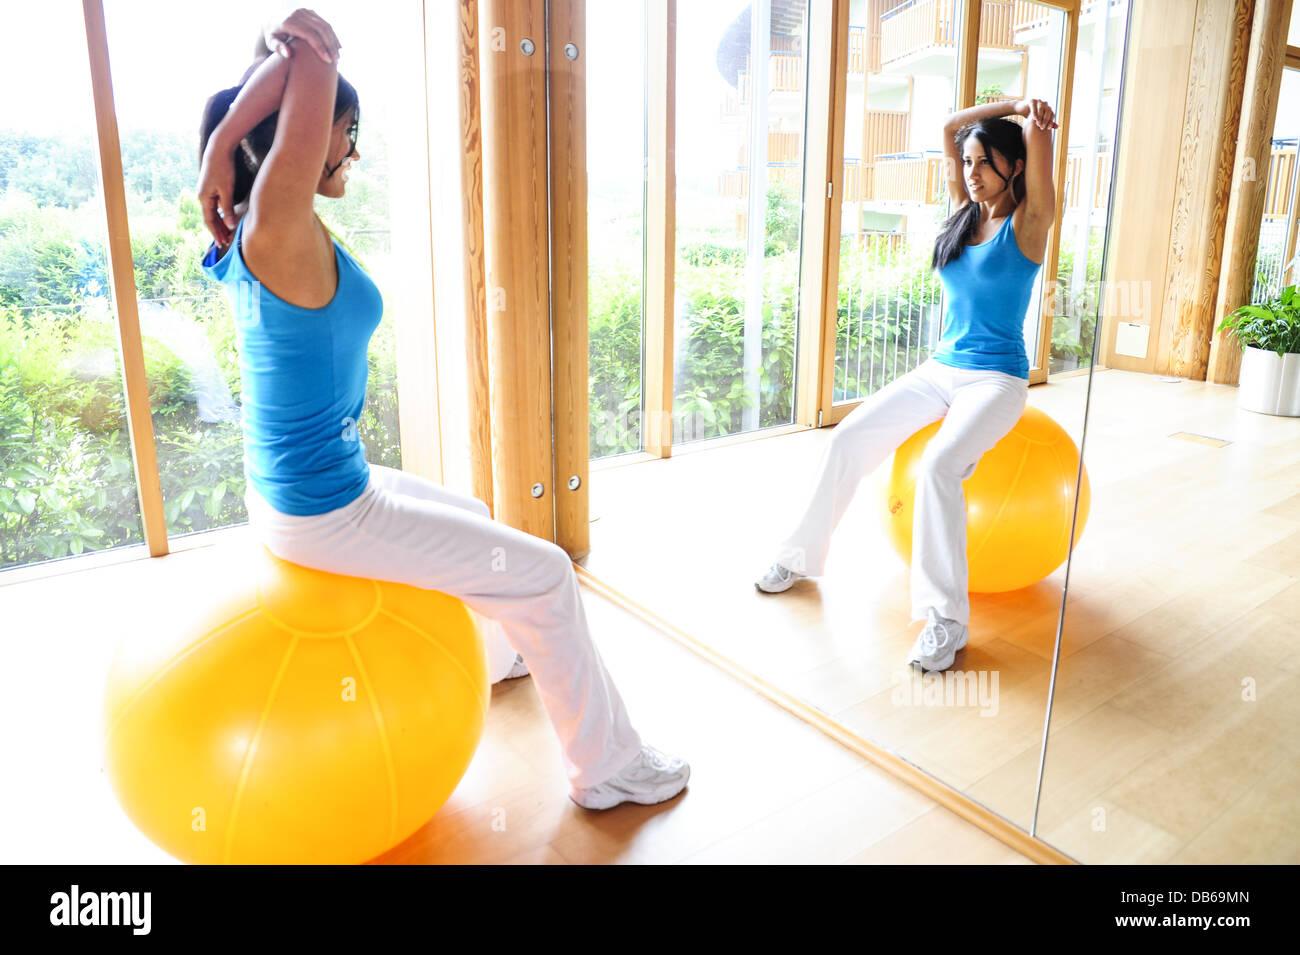 Øvre rygsmerter Stock fotos Øvre rygsmerter-5174